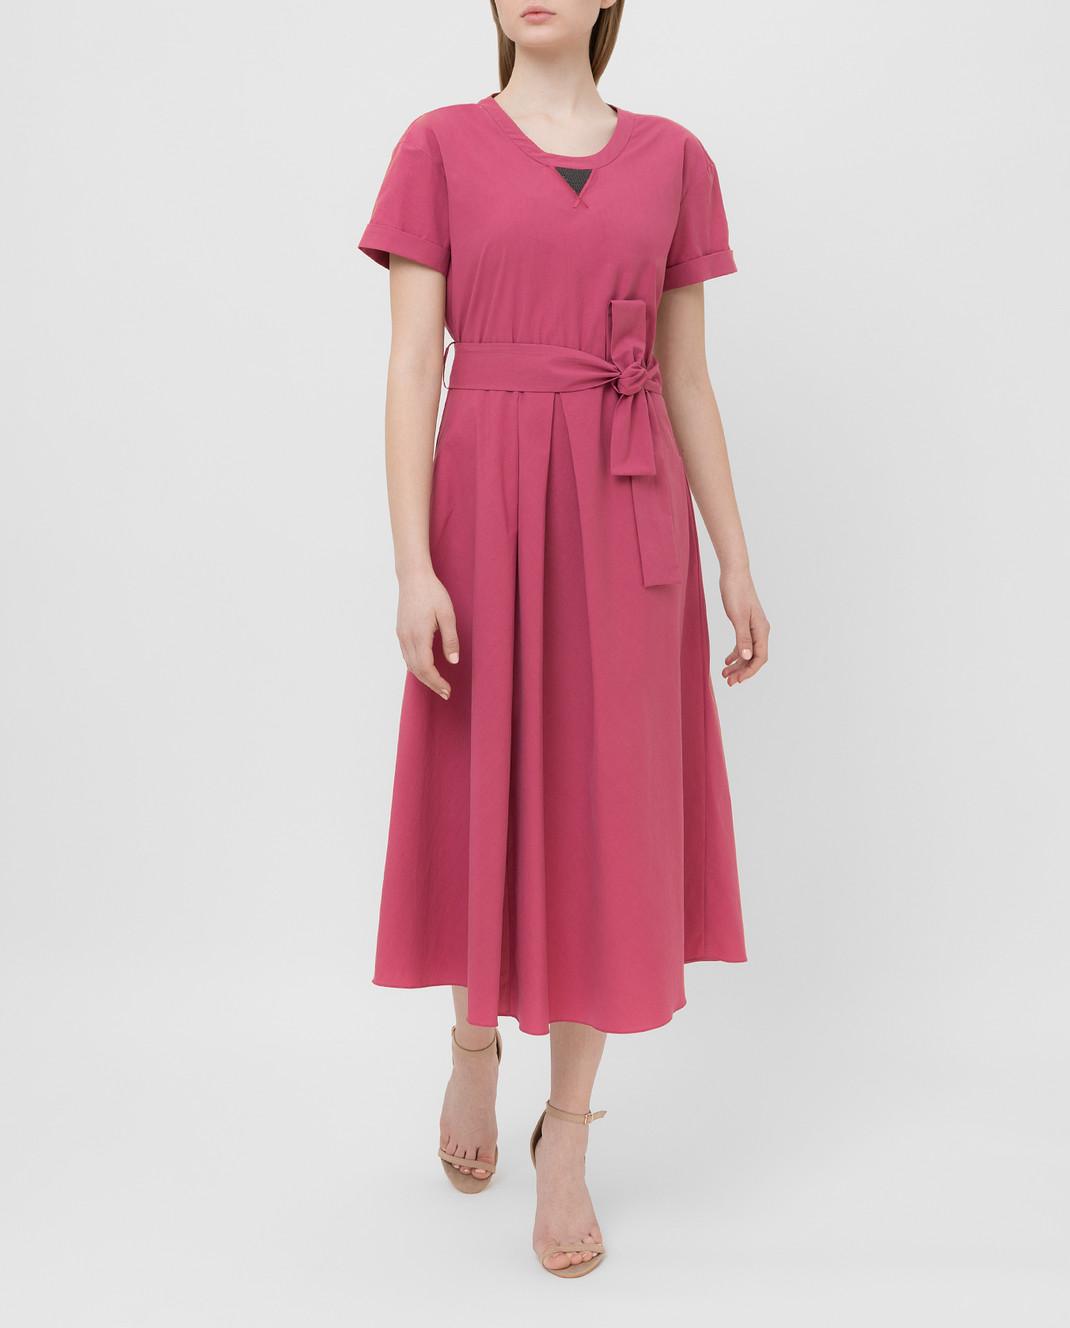 Brunello Cucinelli Розовое платье MH127ABV72 изображение 2